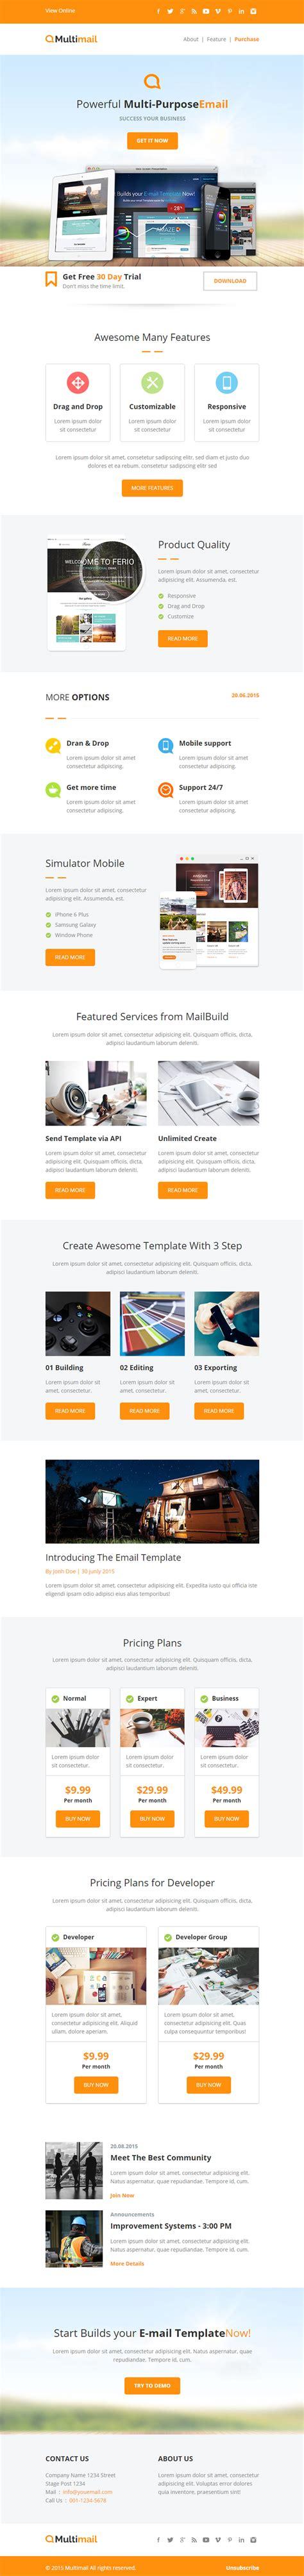 html5 responsive email template multimail premium responsive email set mailbuild